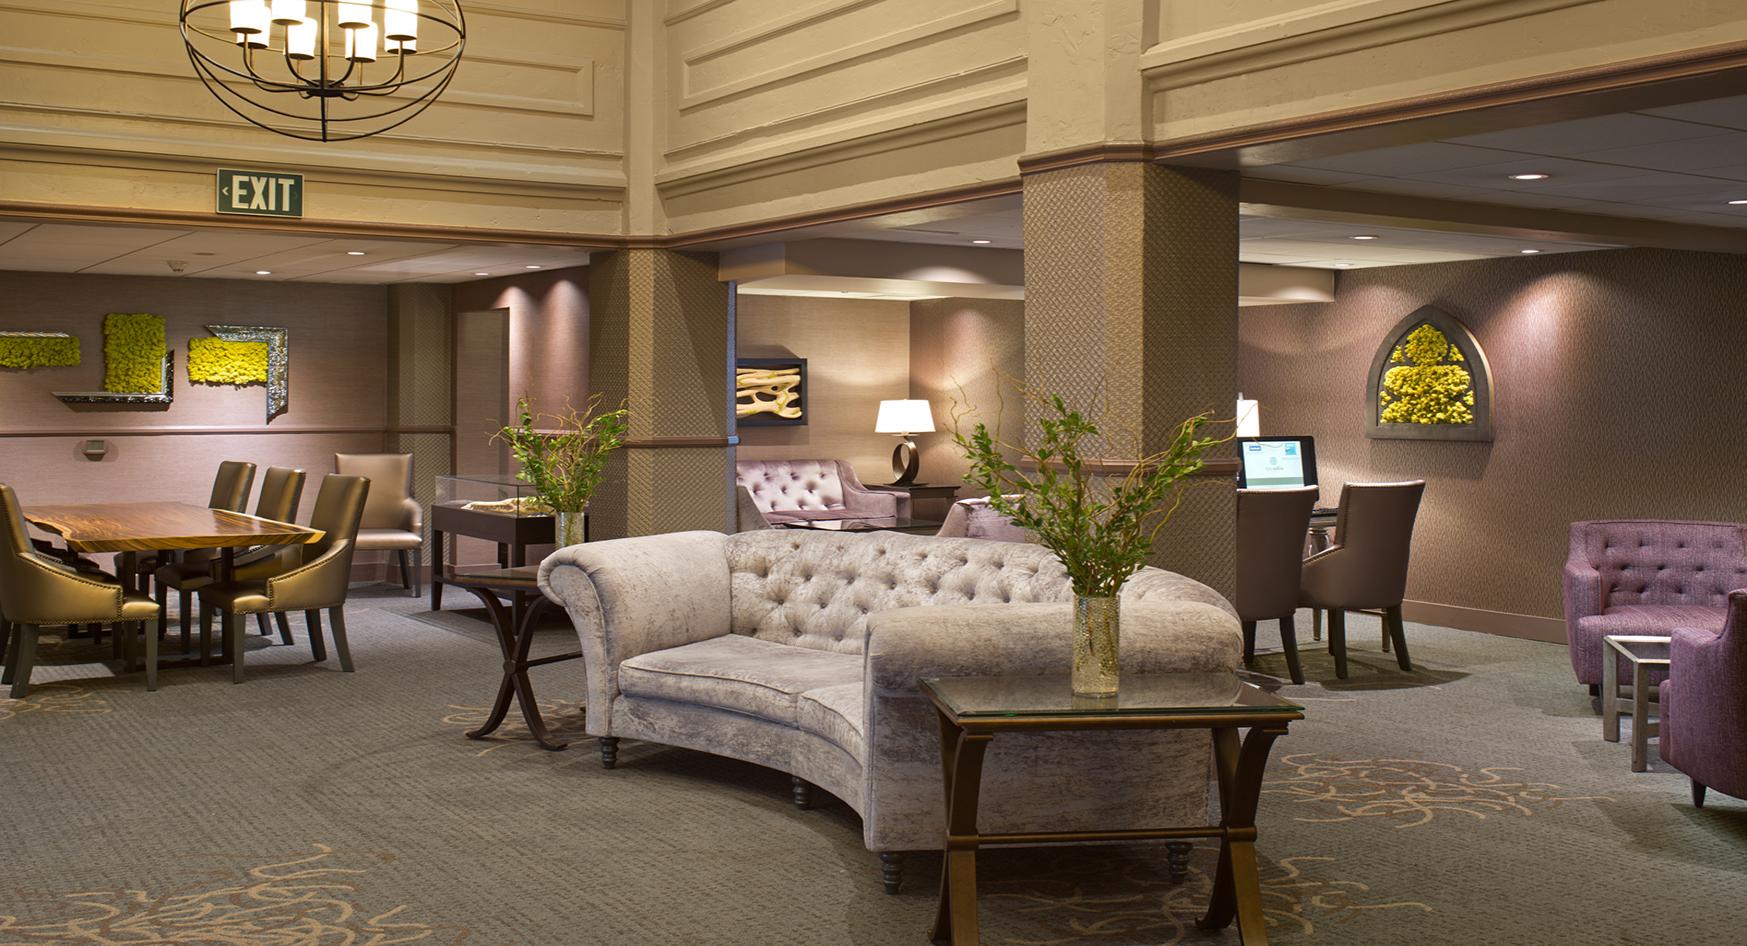 The Sofia San Diego Hotel